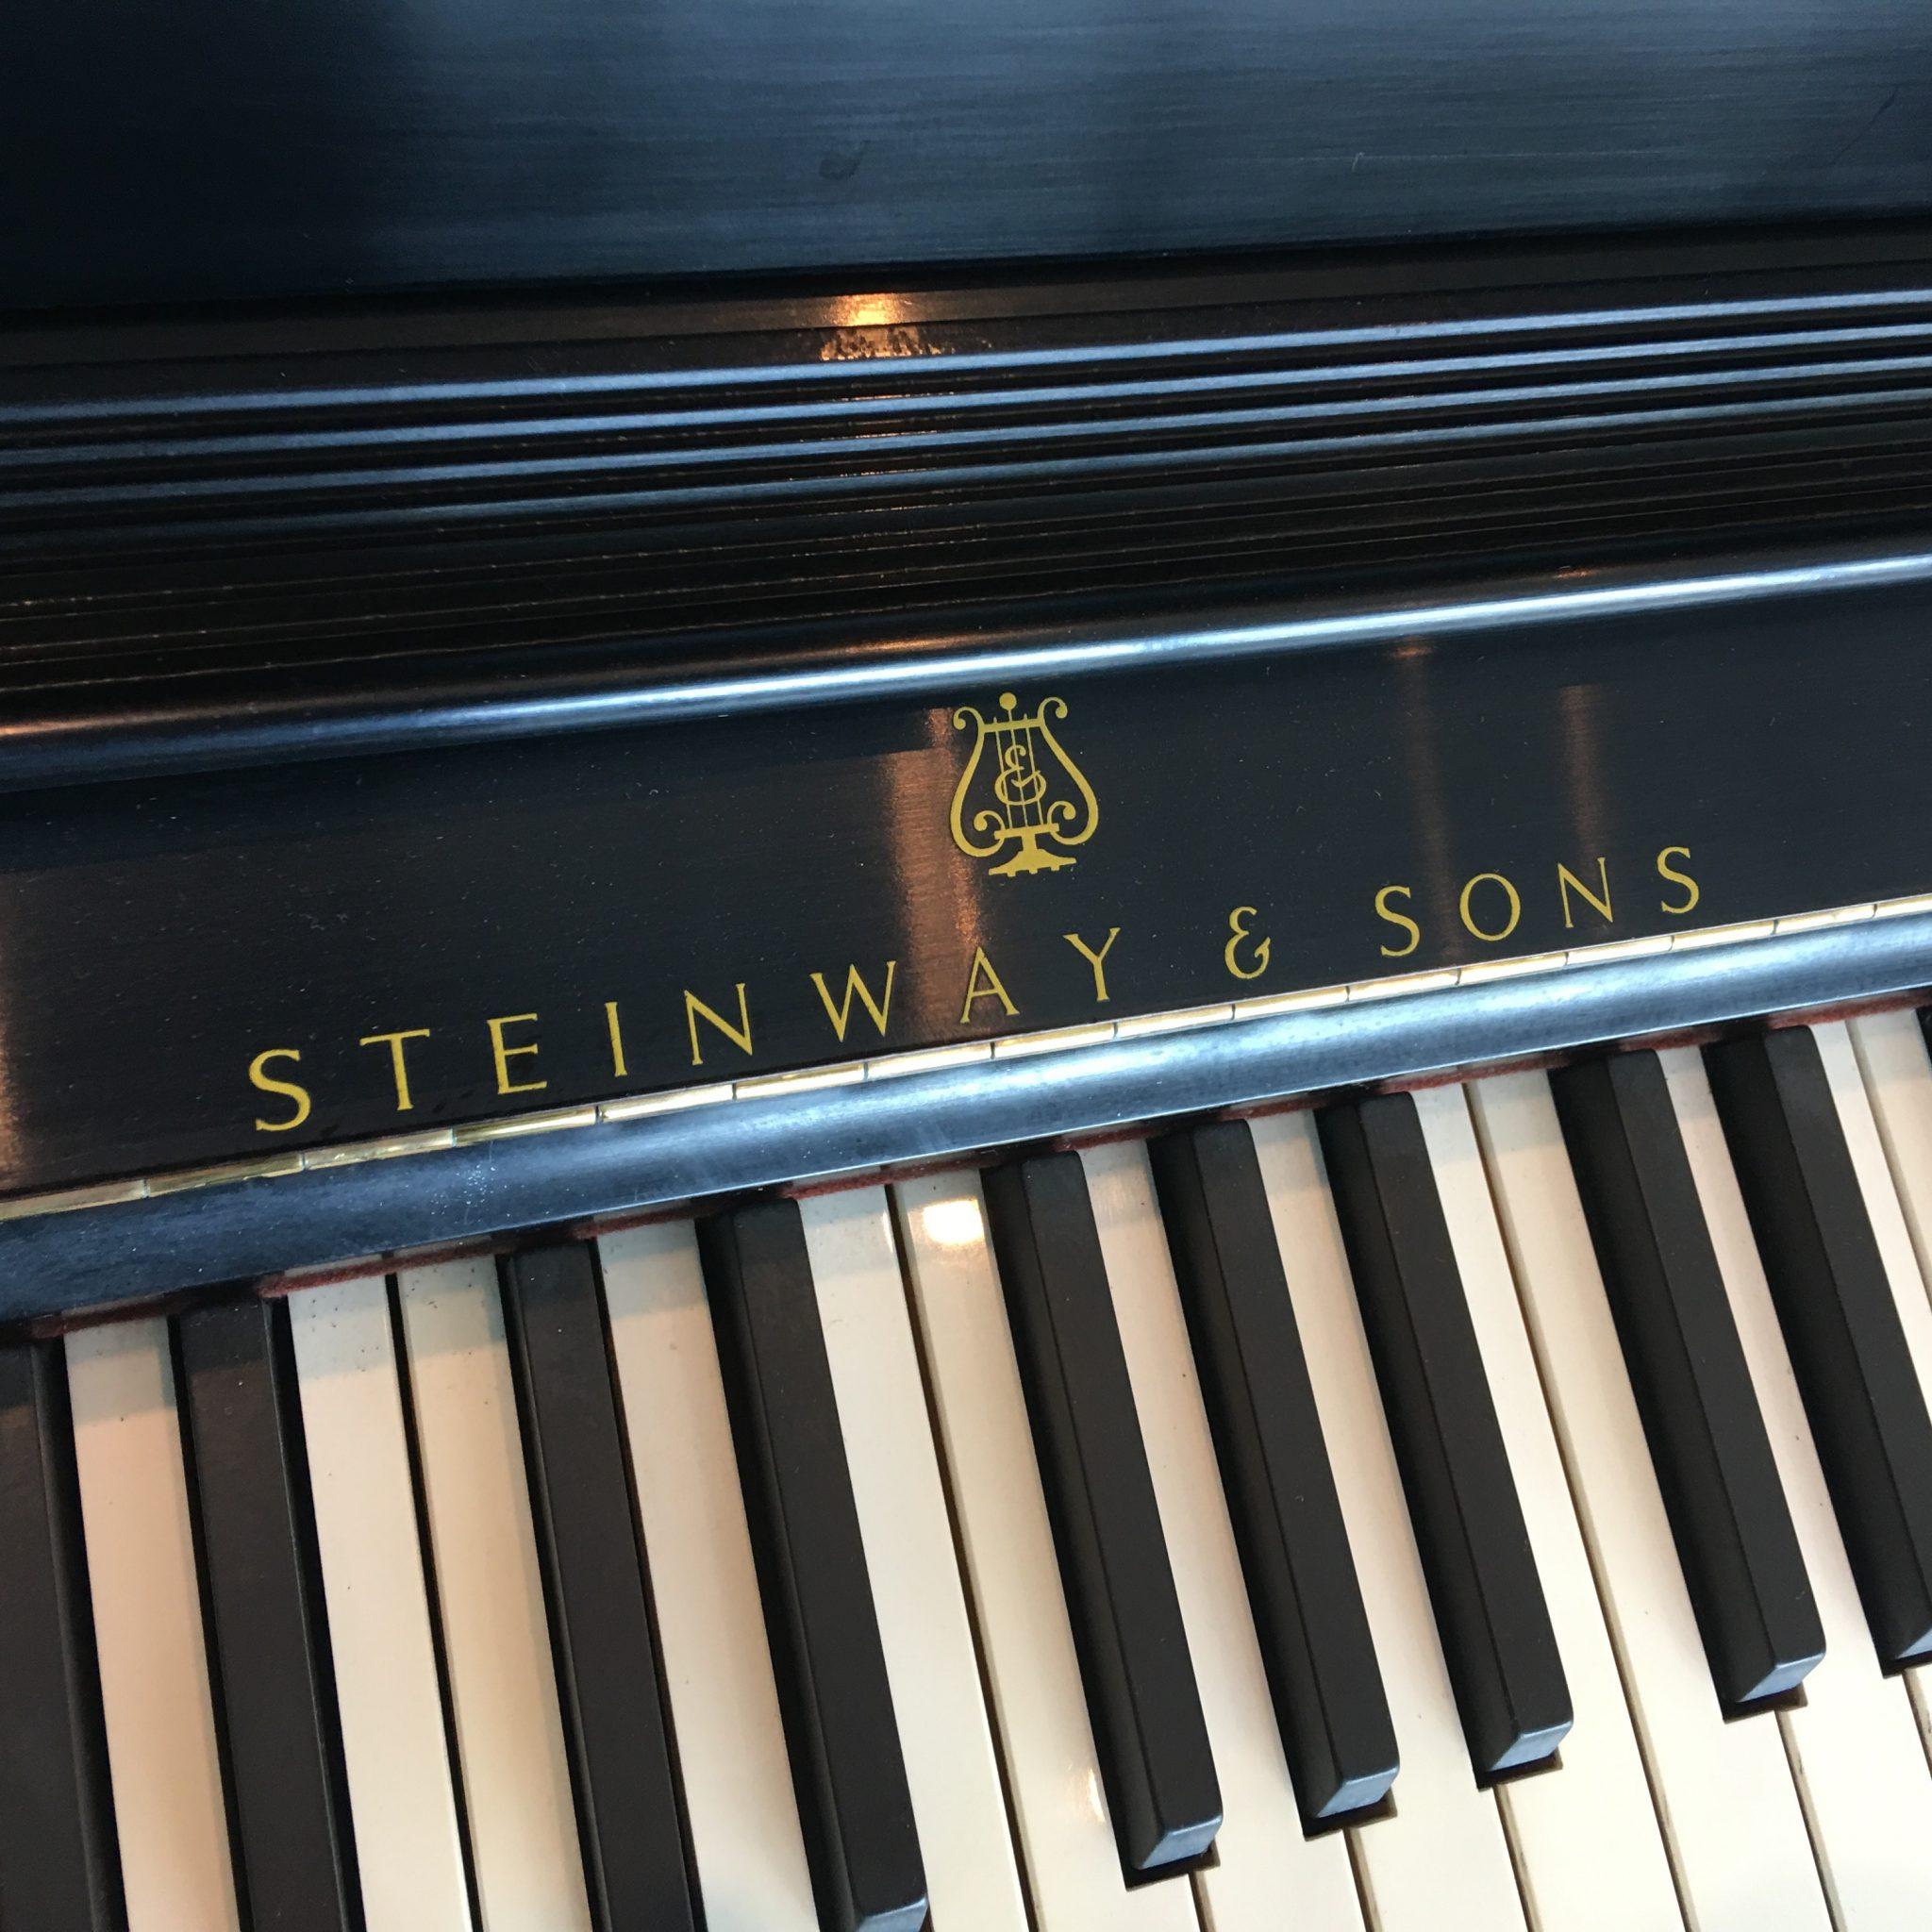 1973 Steinway & Sons 1098 Studio